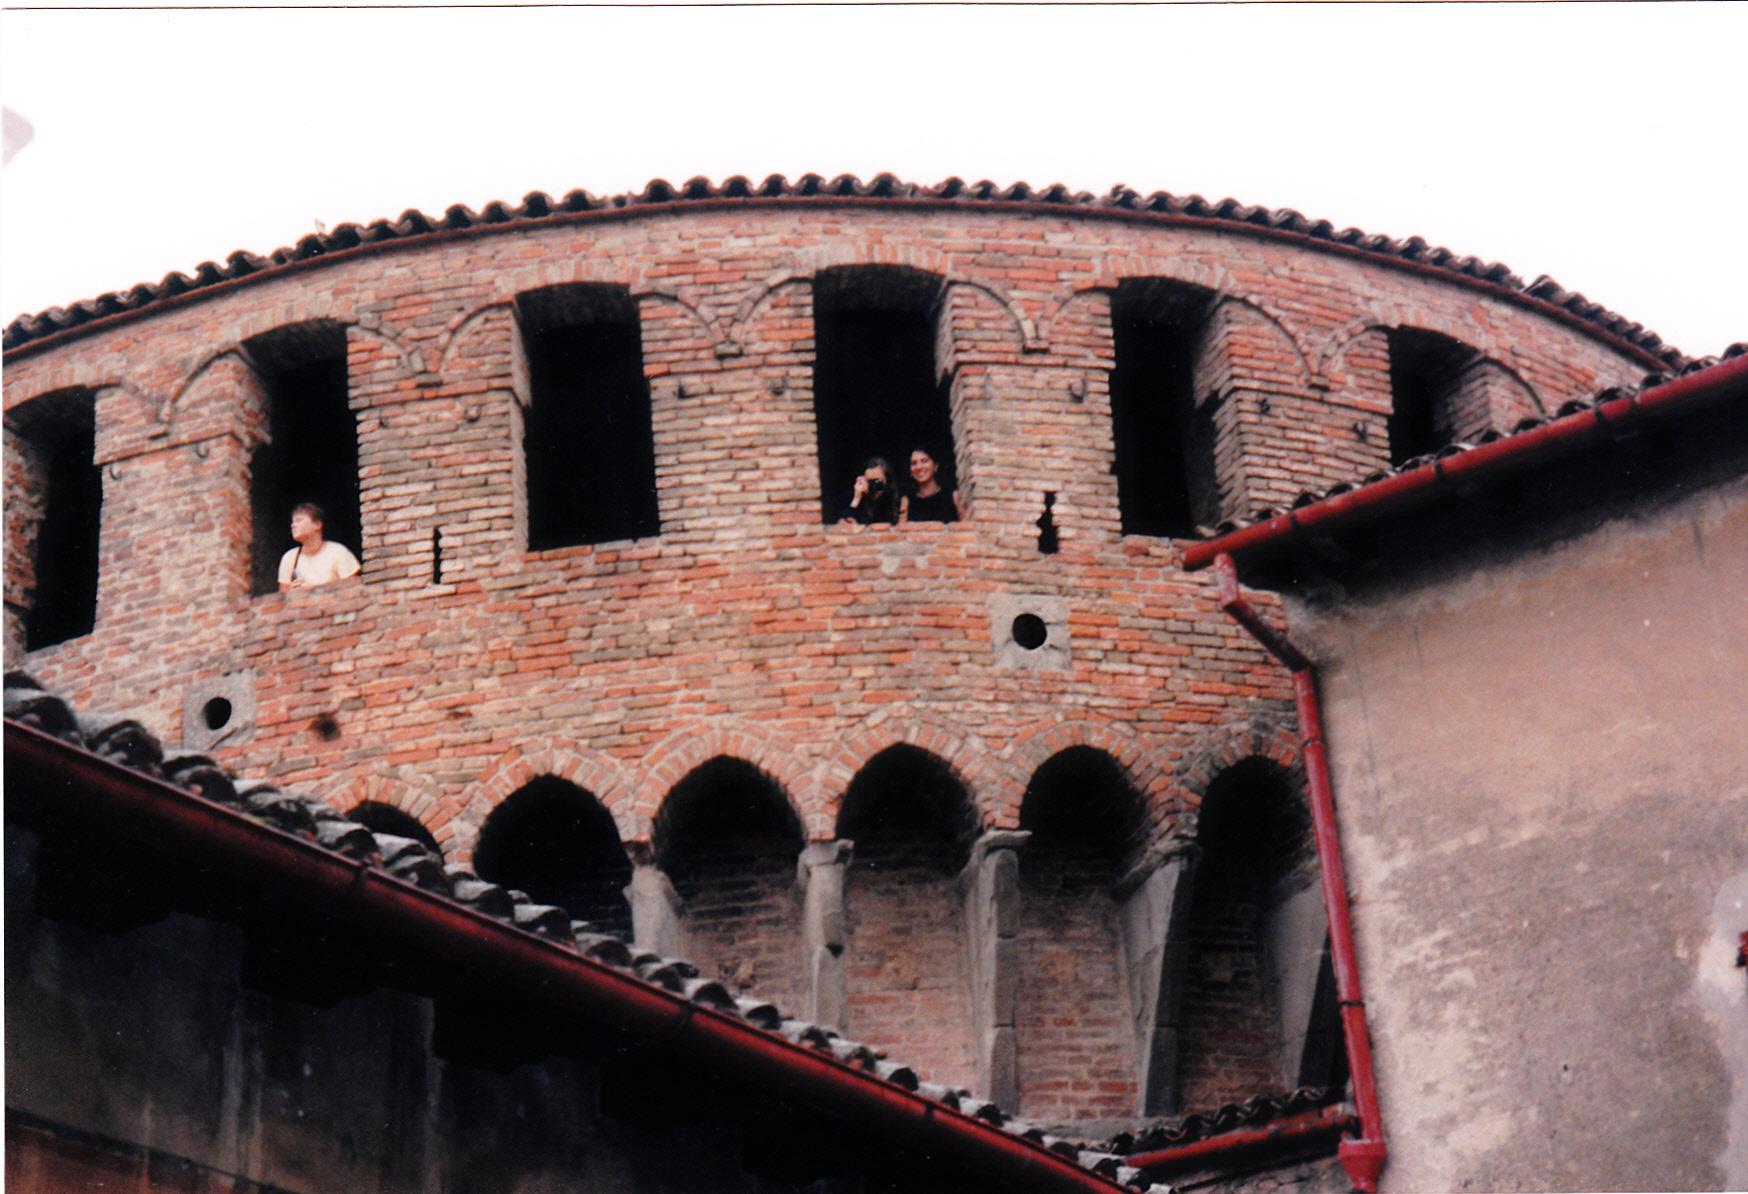 Photos 1 and 2 Bologna 98-992